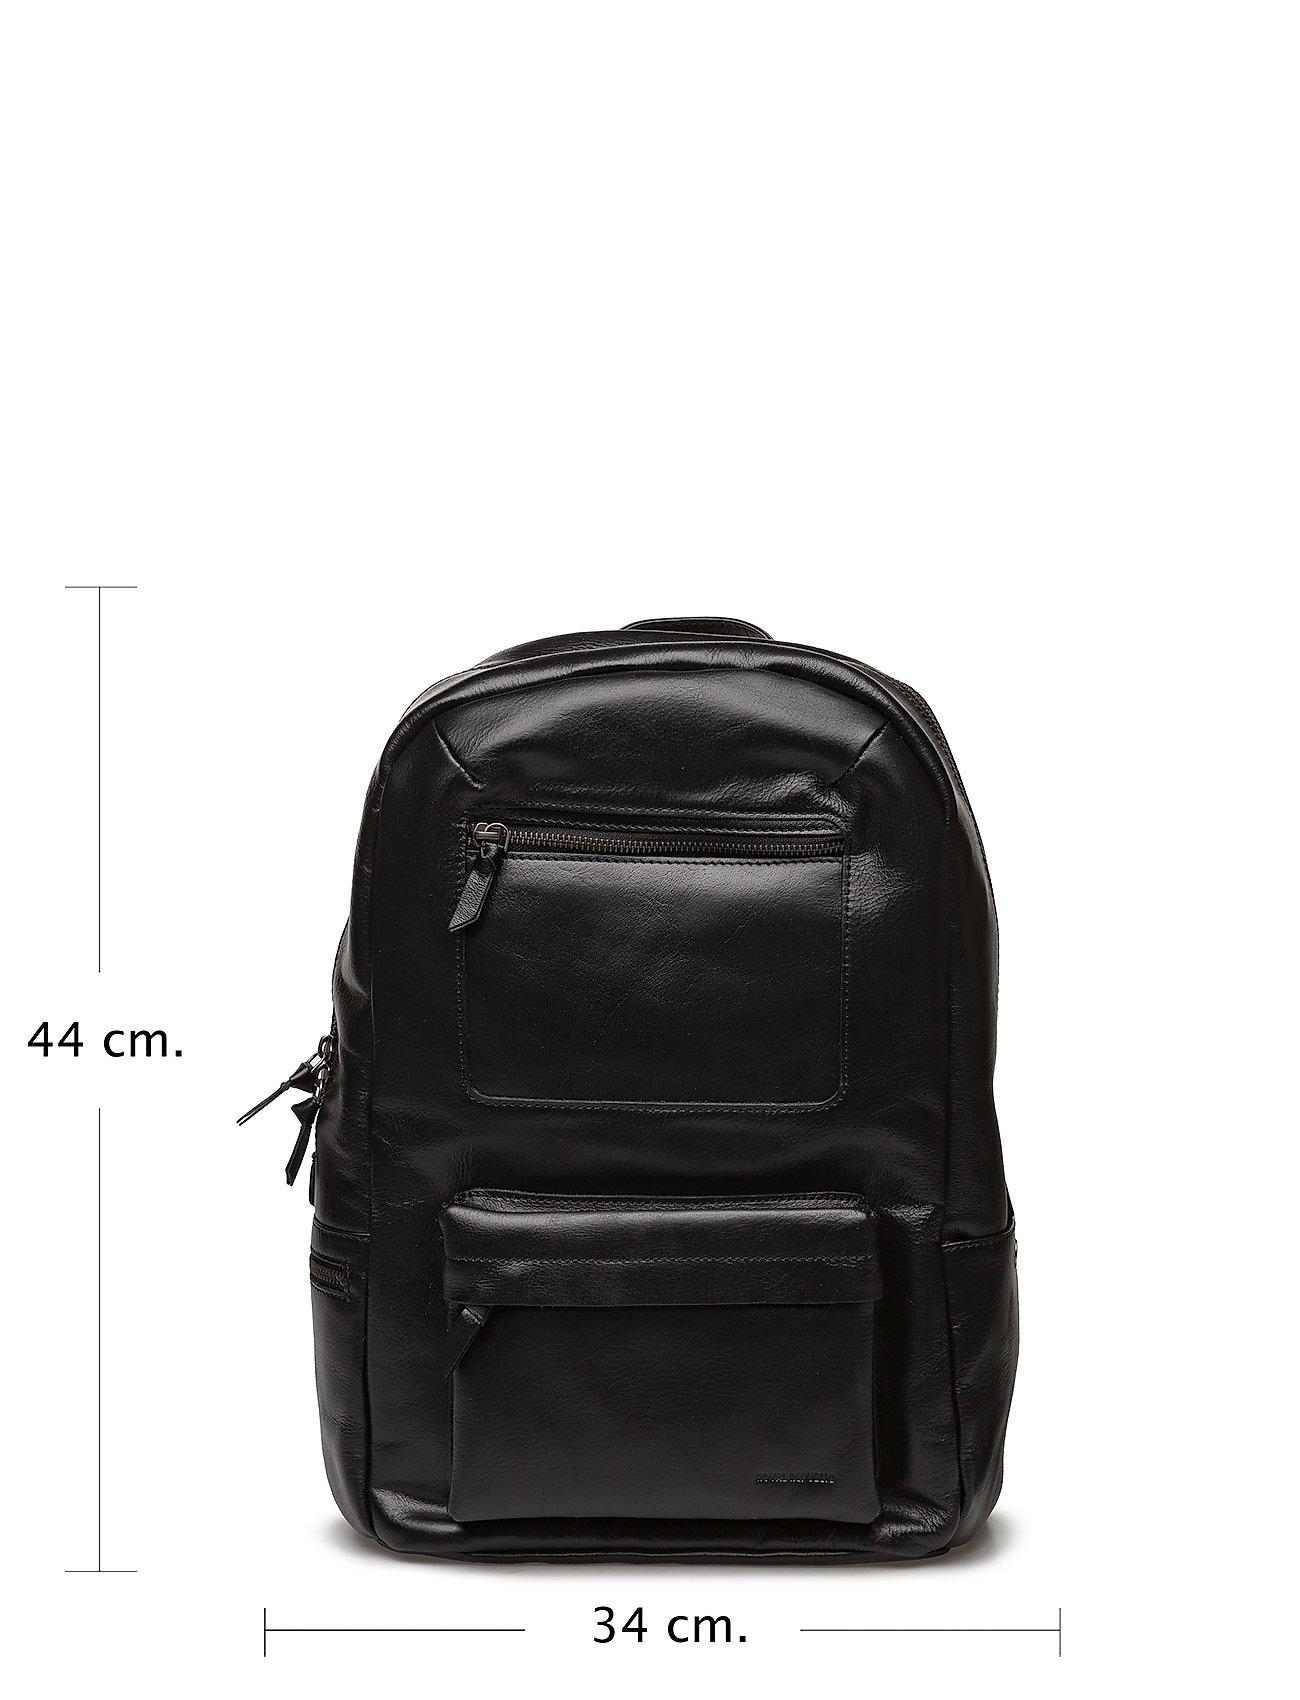 2b02902cd85 ... Royal RepubliQ RepubliQ RepubliQ Track Backpack Ryggsäckar 477ce9